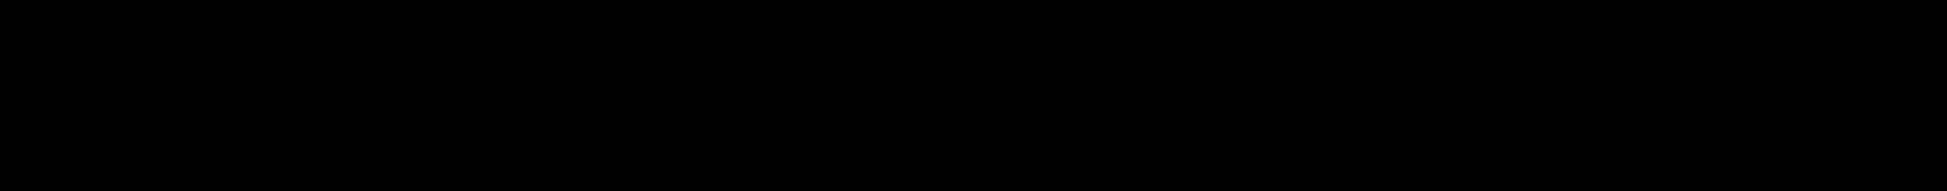 Design System F 100I